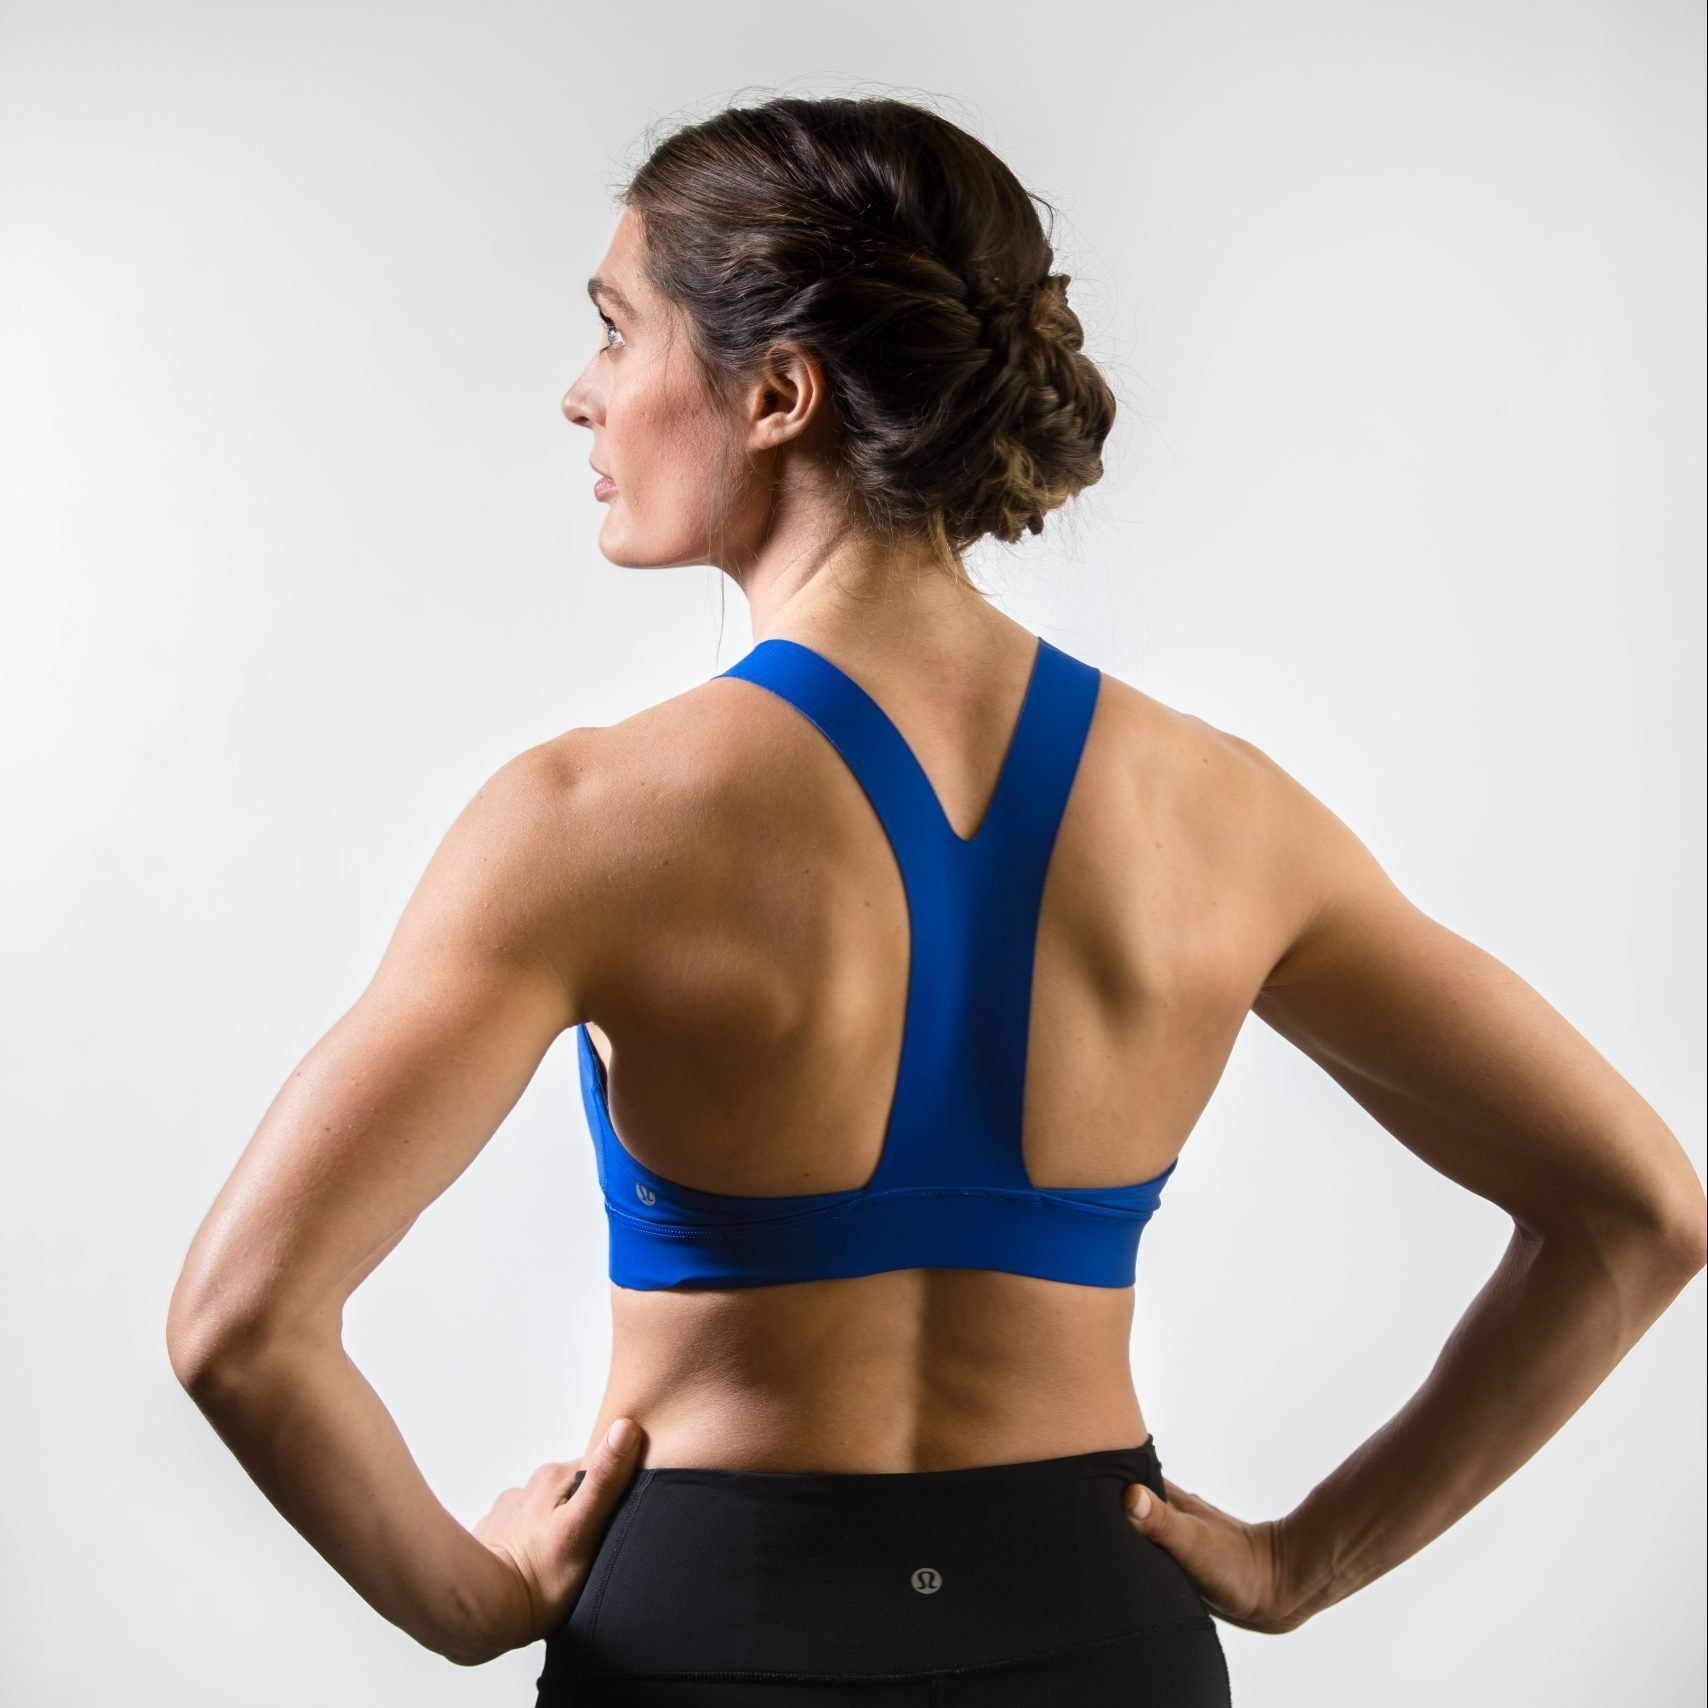 Reverse Dieting and Metabolism Restoration